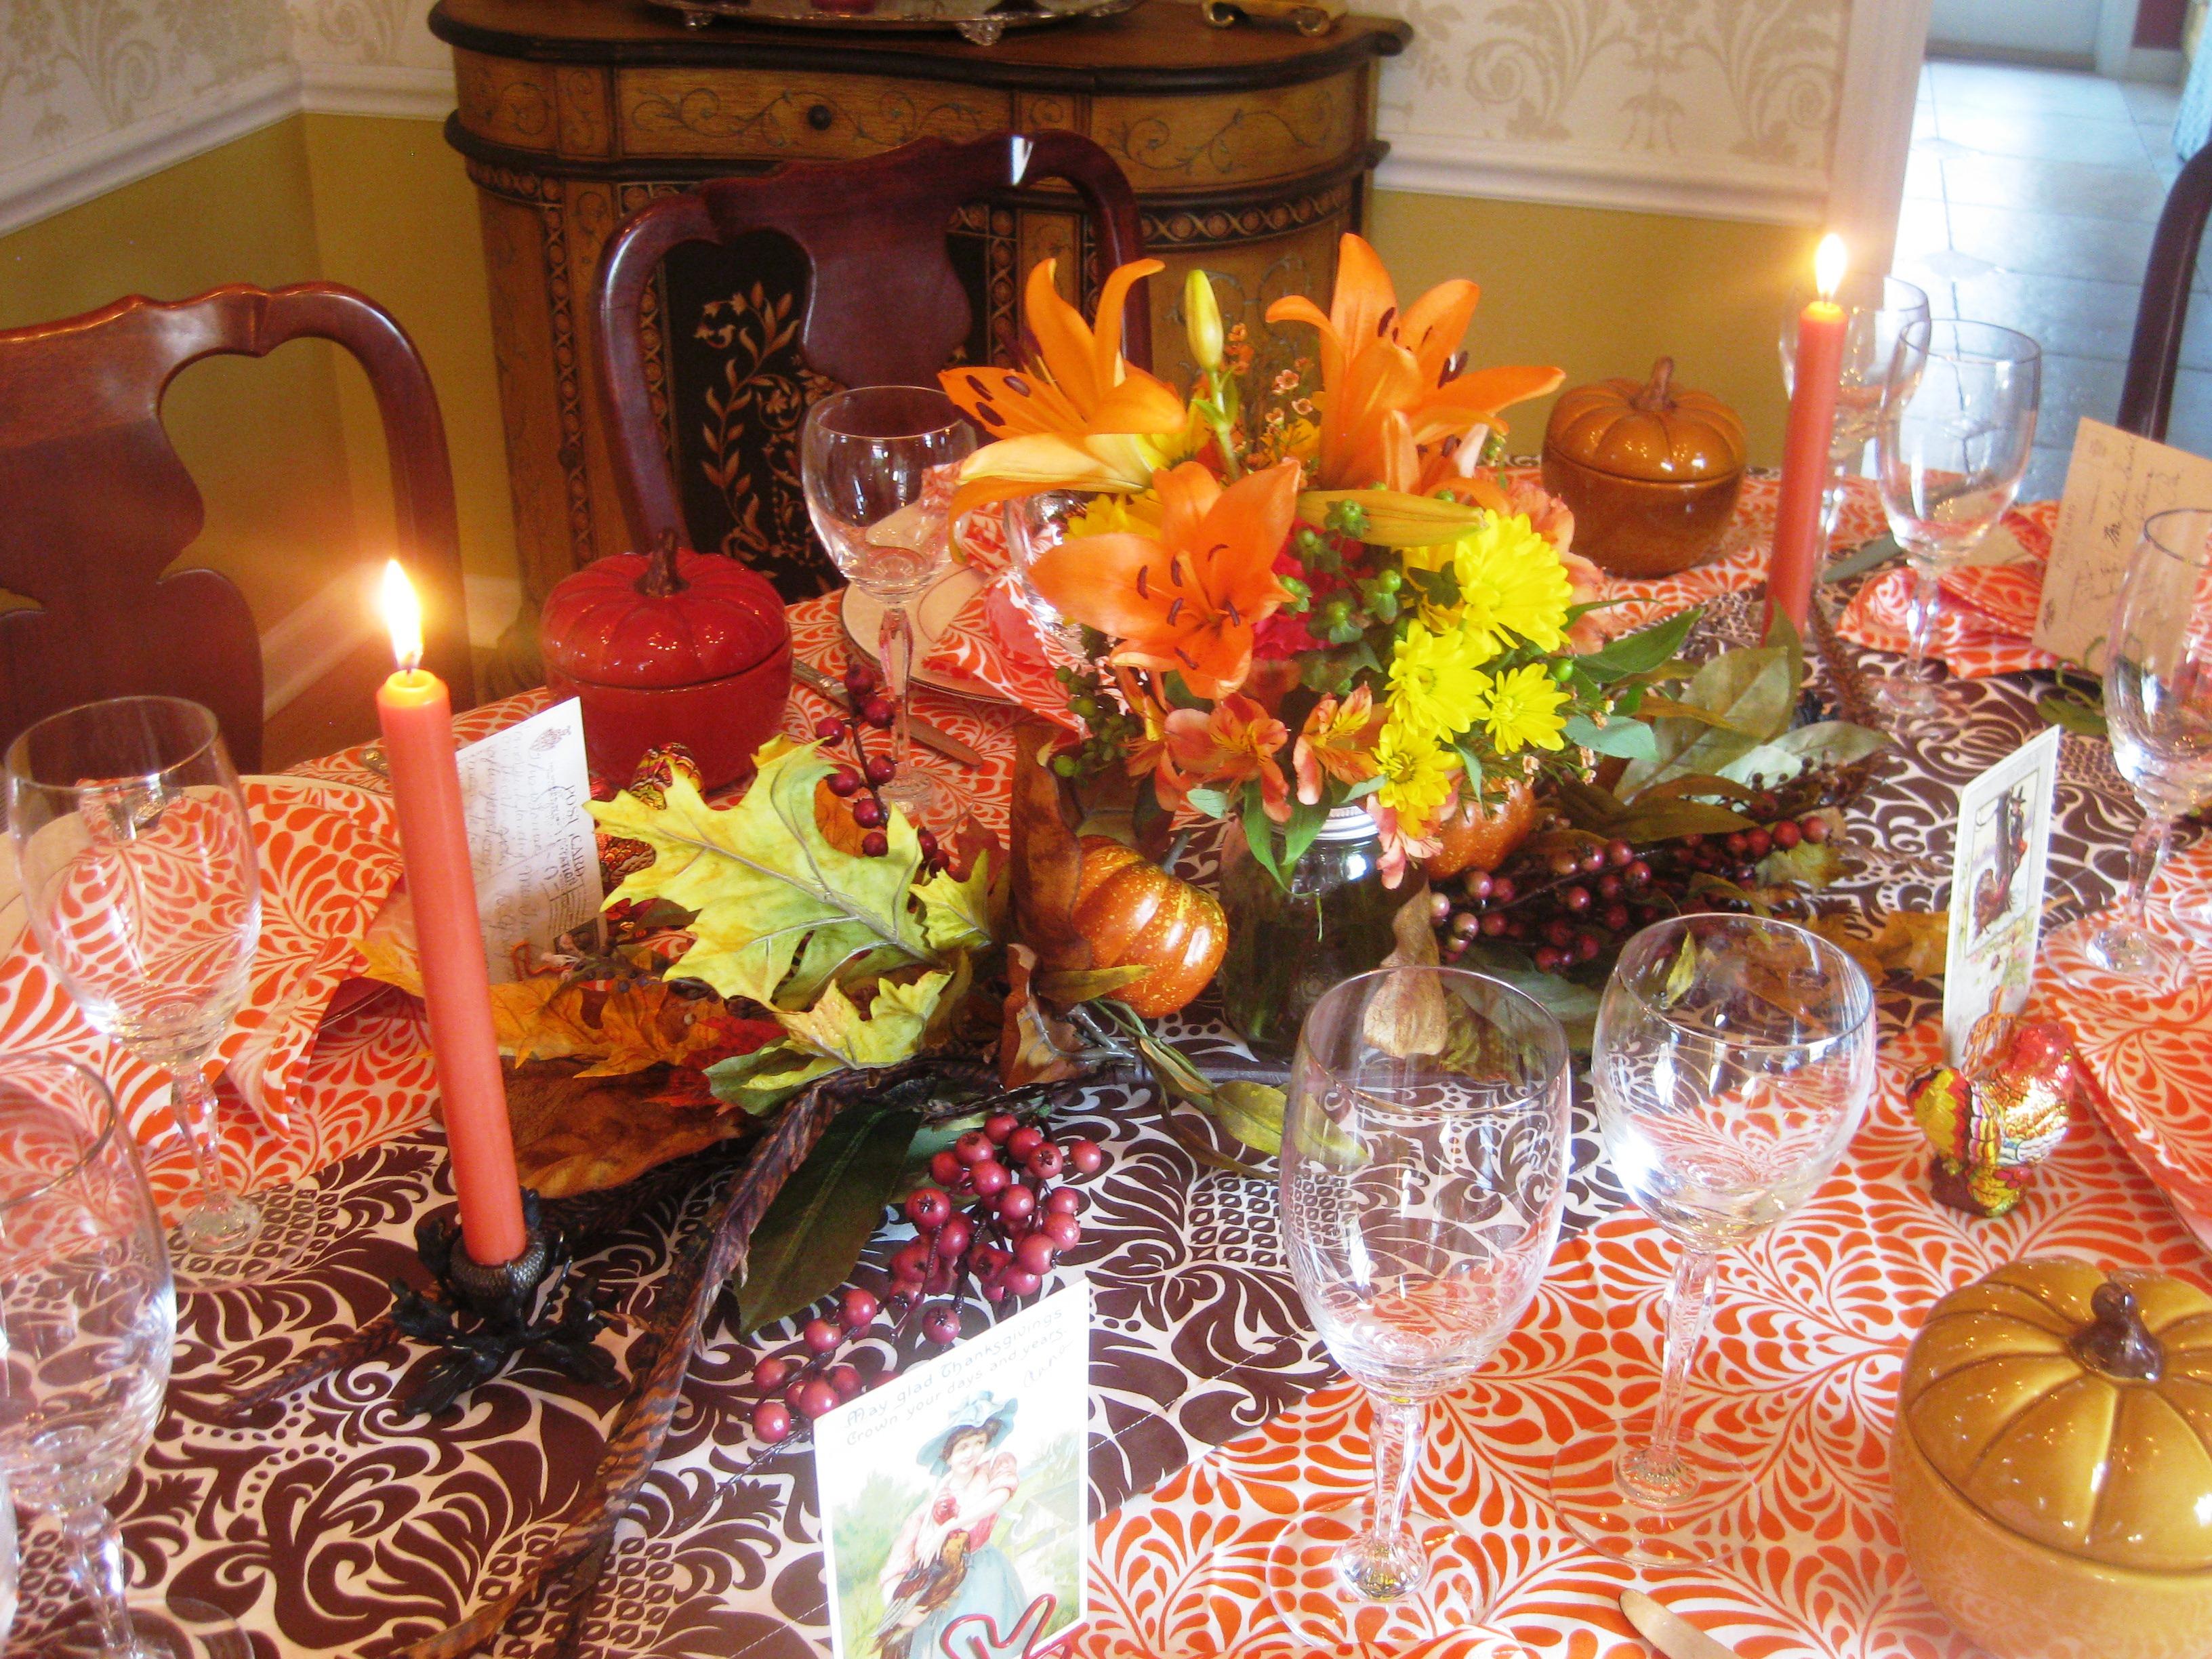 187 Festive Harvest Table Red Door Table Decor